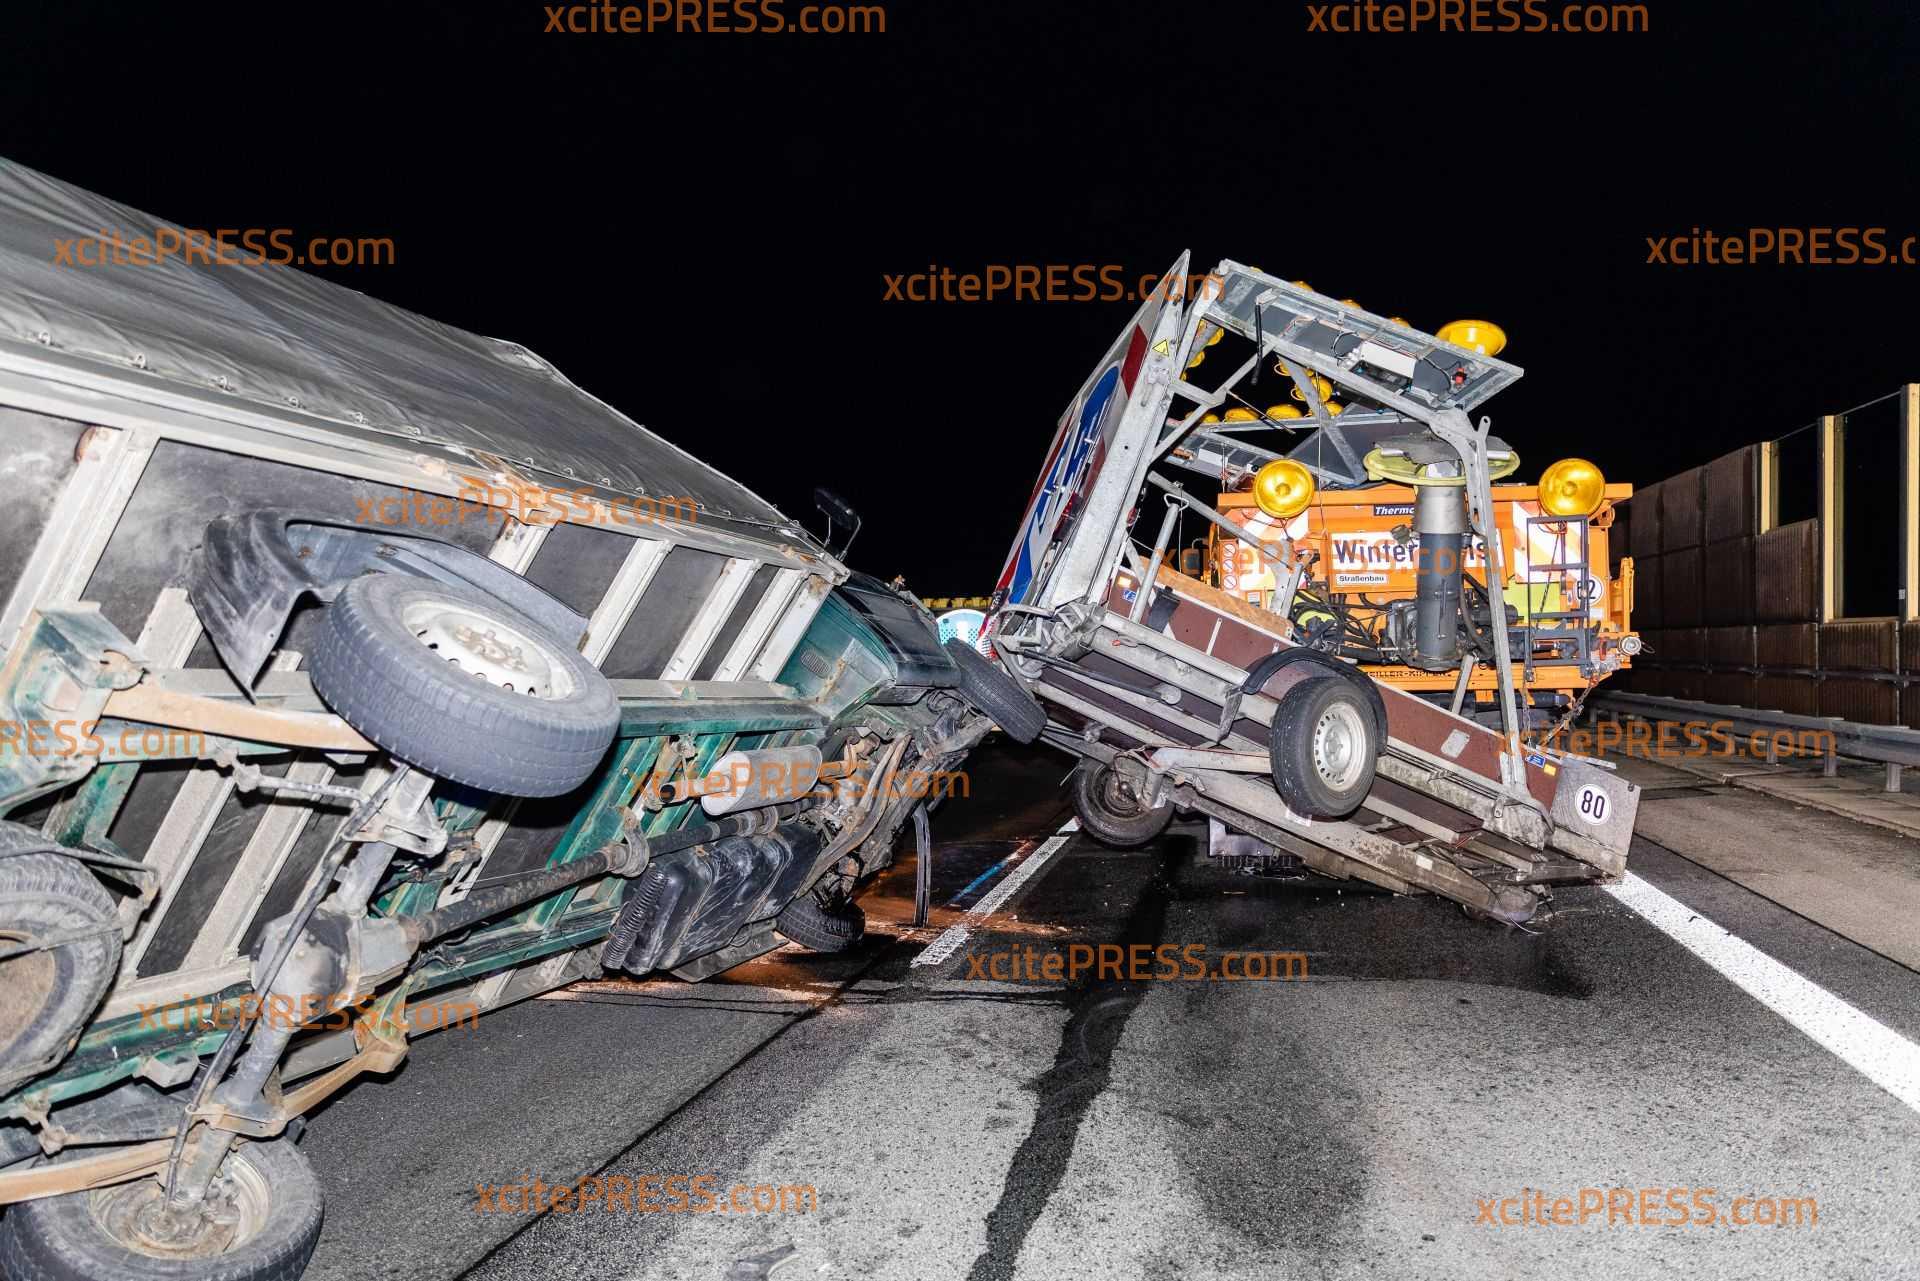 Transporter kracht in Schilderwagen: Autobahn 4 nach spektakulärem Unfall gesperrt: Insgesamt neun Kilometer Rückstau